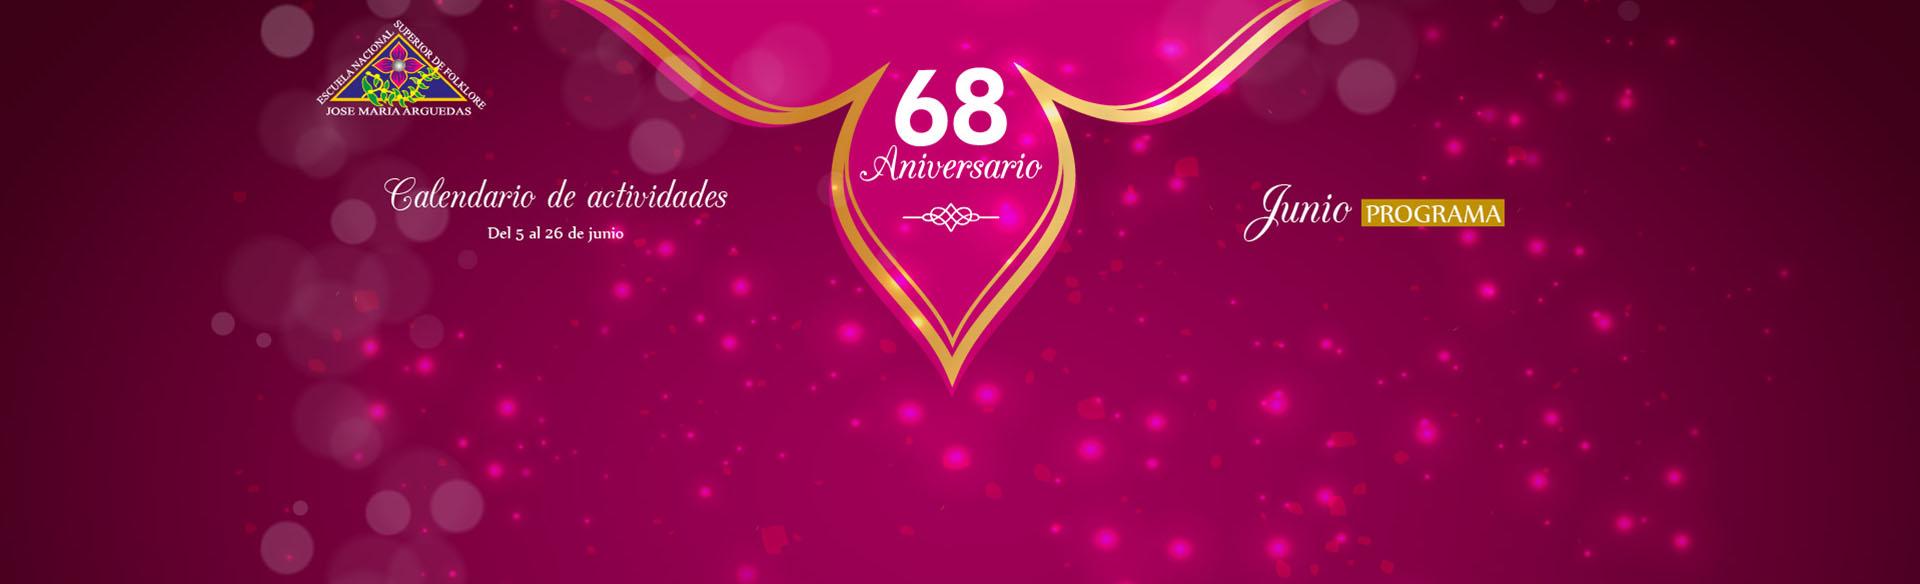 slider_68aniversario